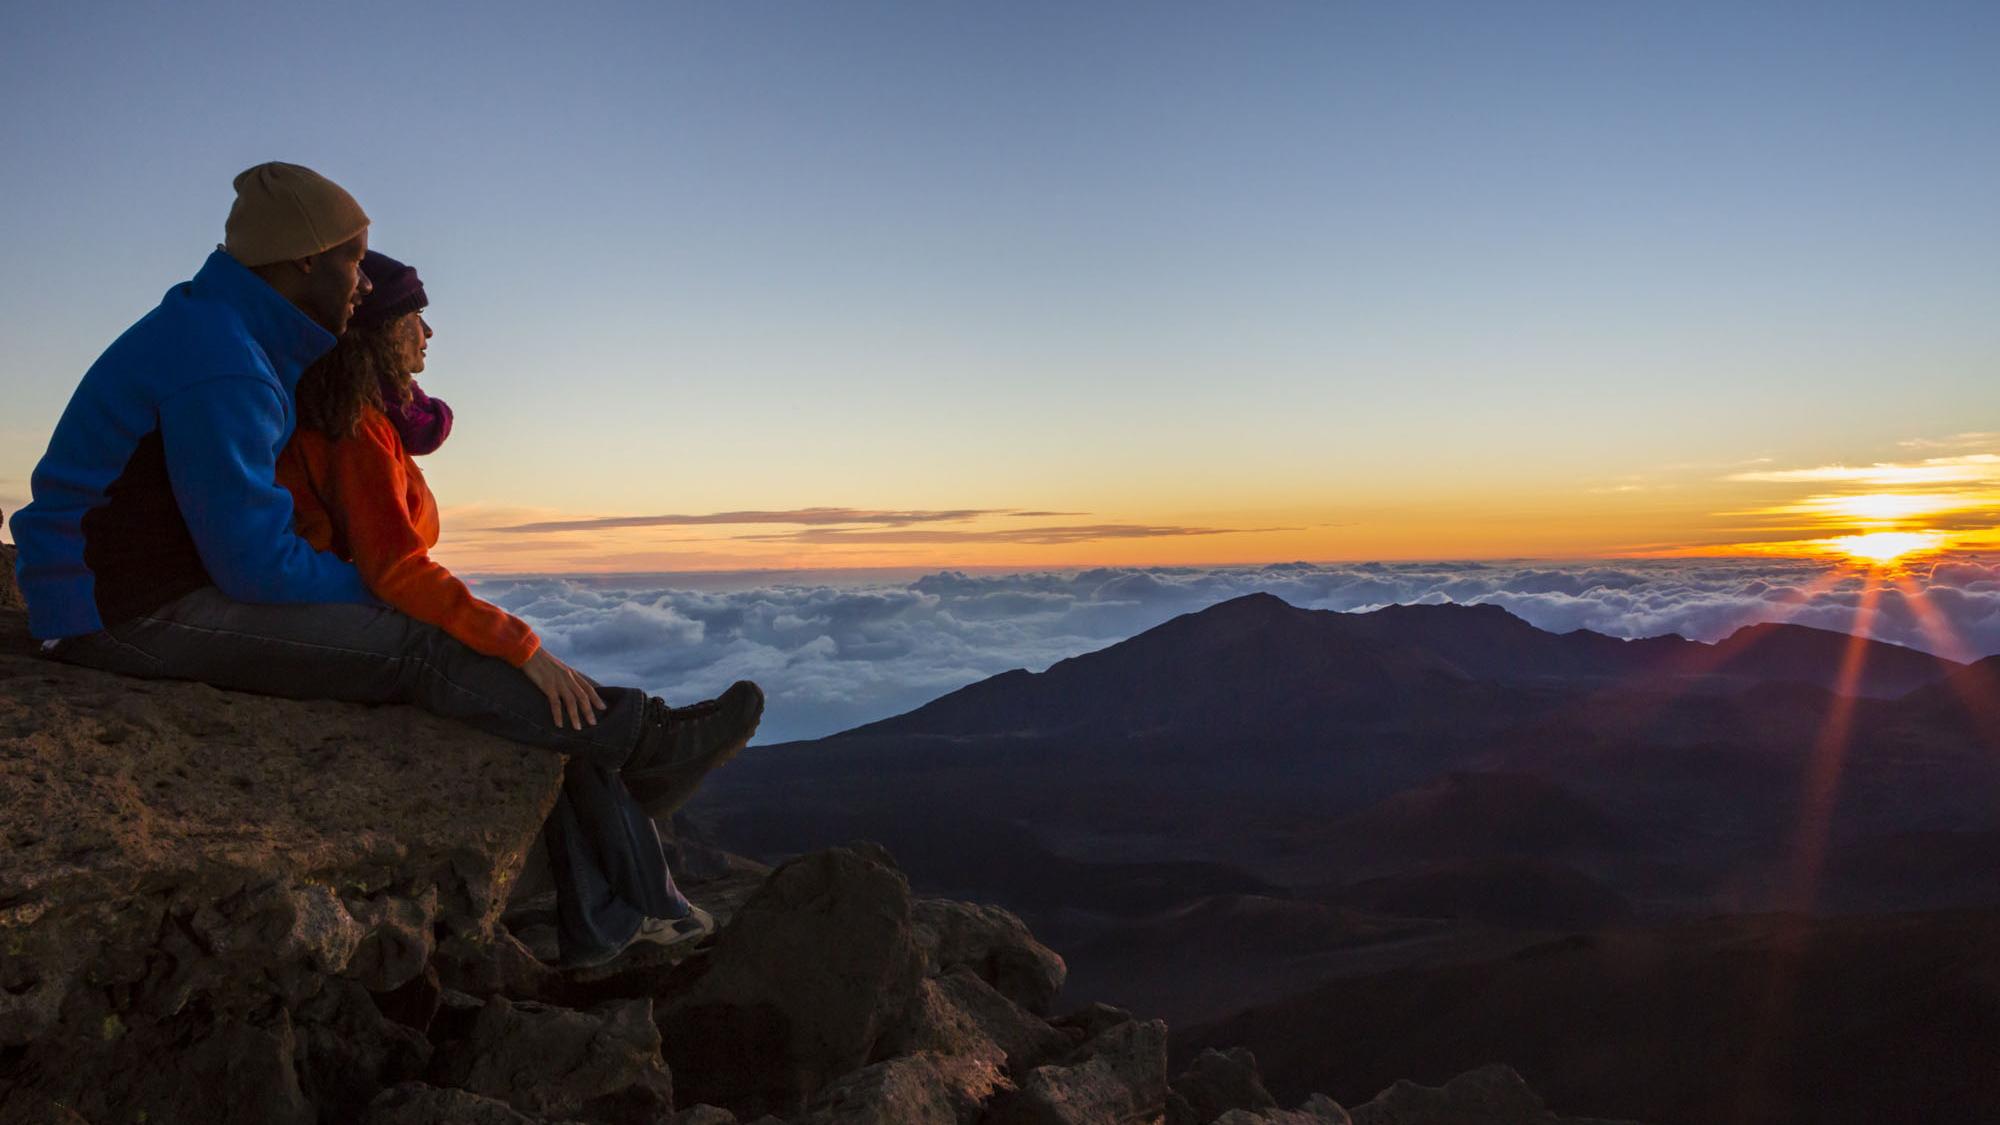 Haleakala National Park awards 4 tour permits: Travel Weekly